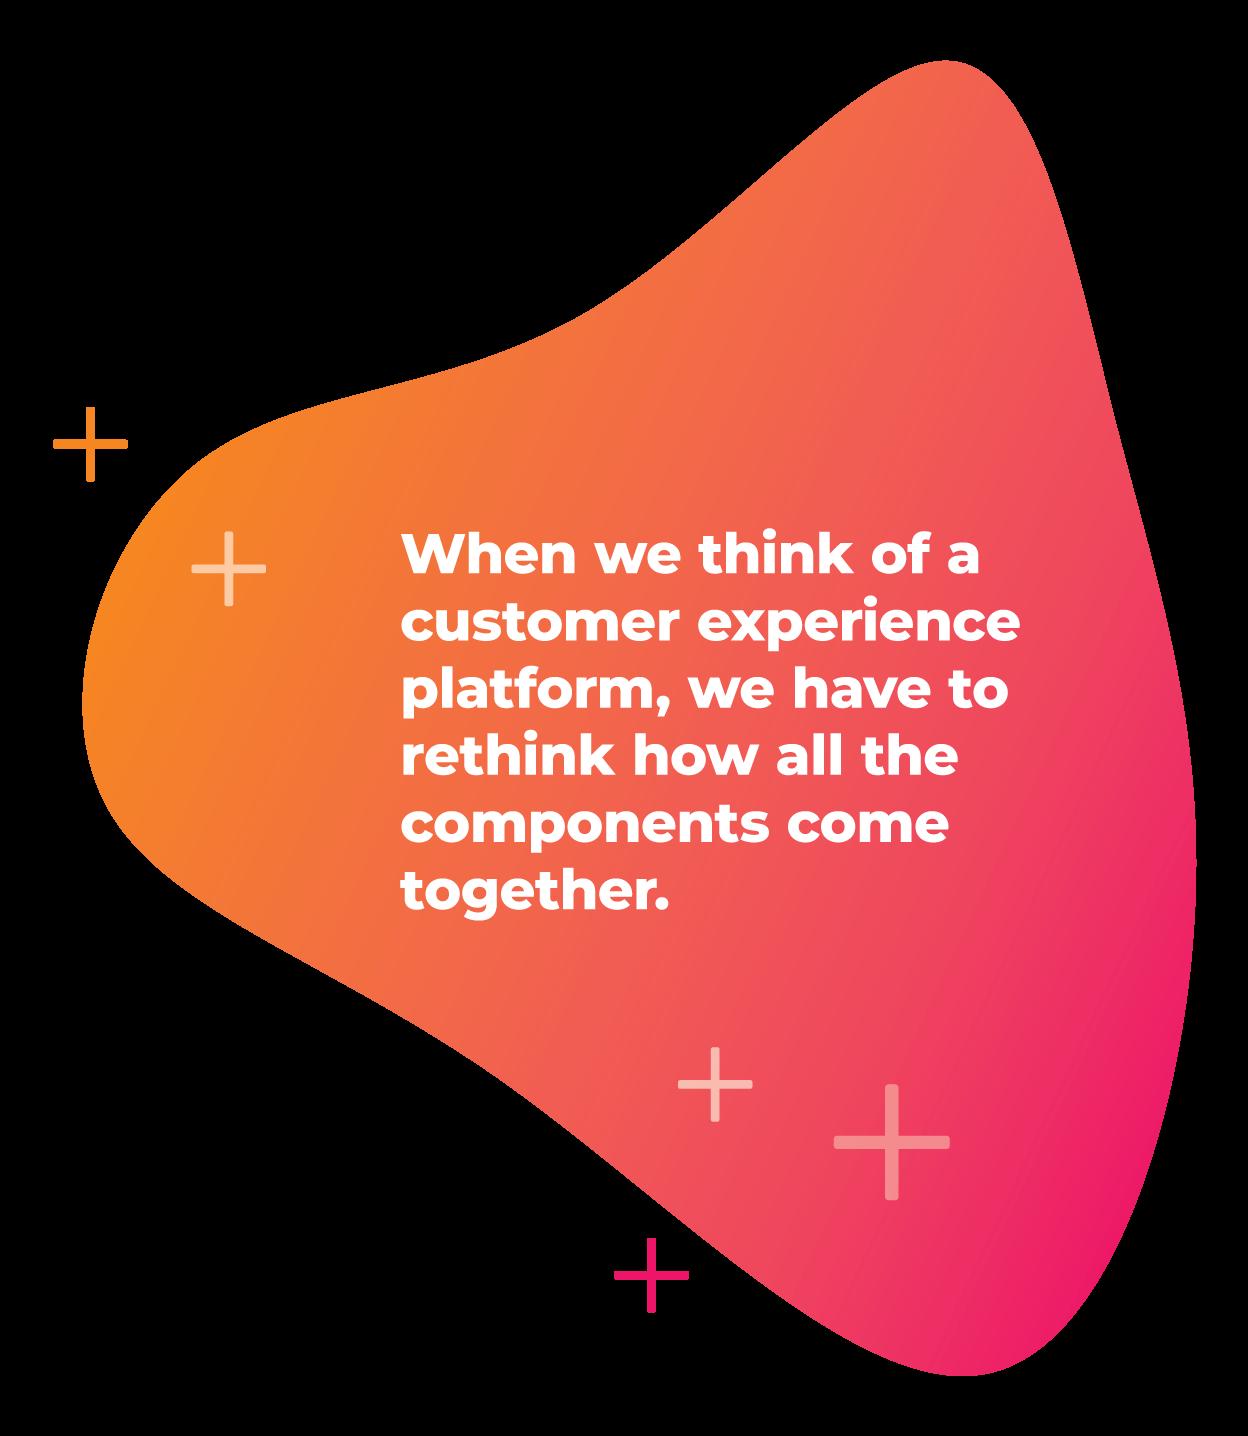 Impulse-CustomerExperience-Platform-01